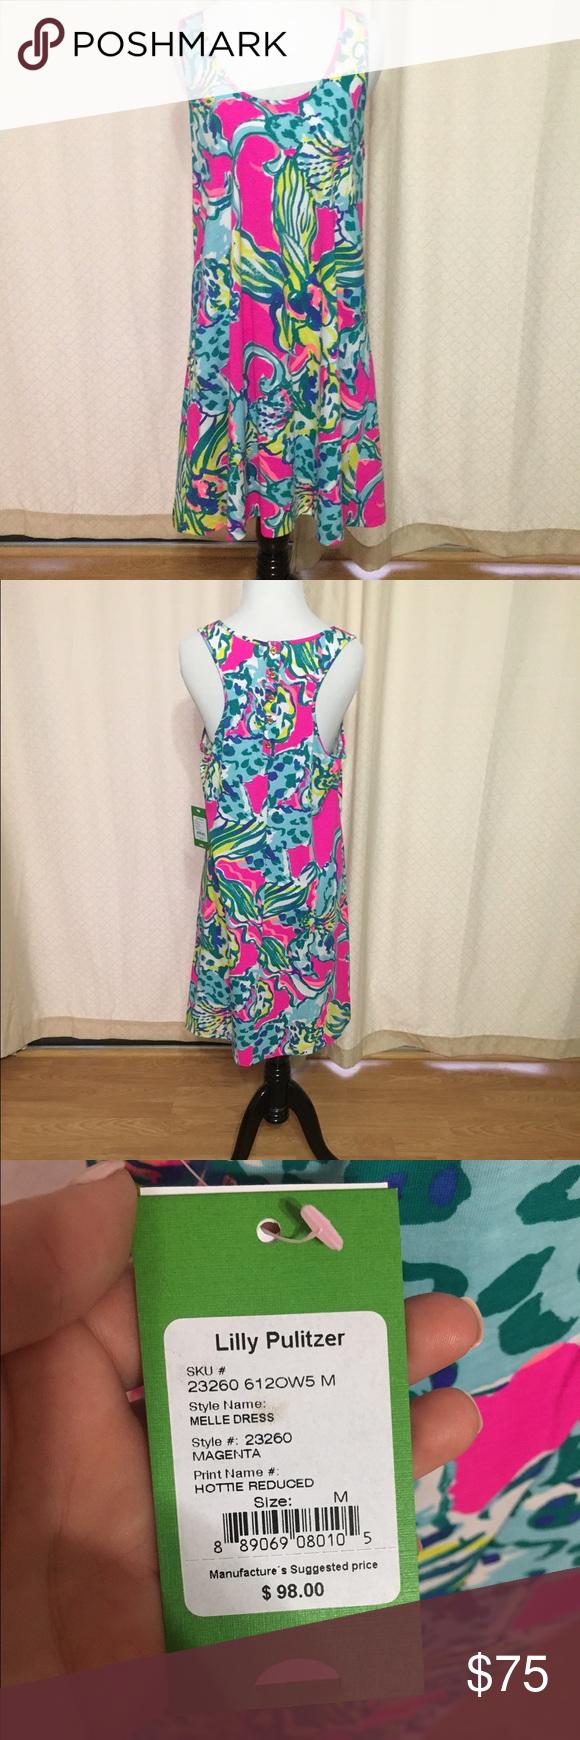 Lilly Pulitzer Dress Medium Lilly Pulitzer dress.  Brand new with tags Lilly Pulitzer Dresses